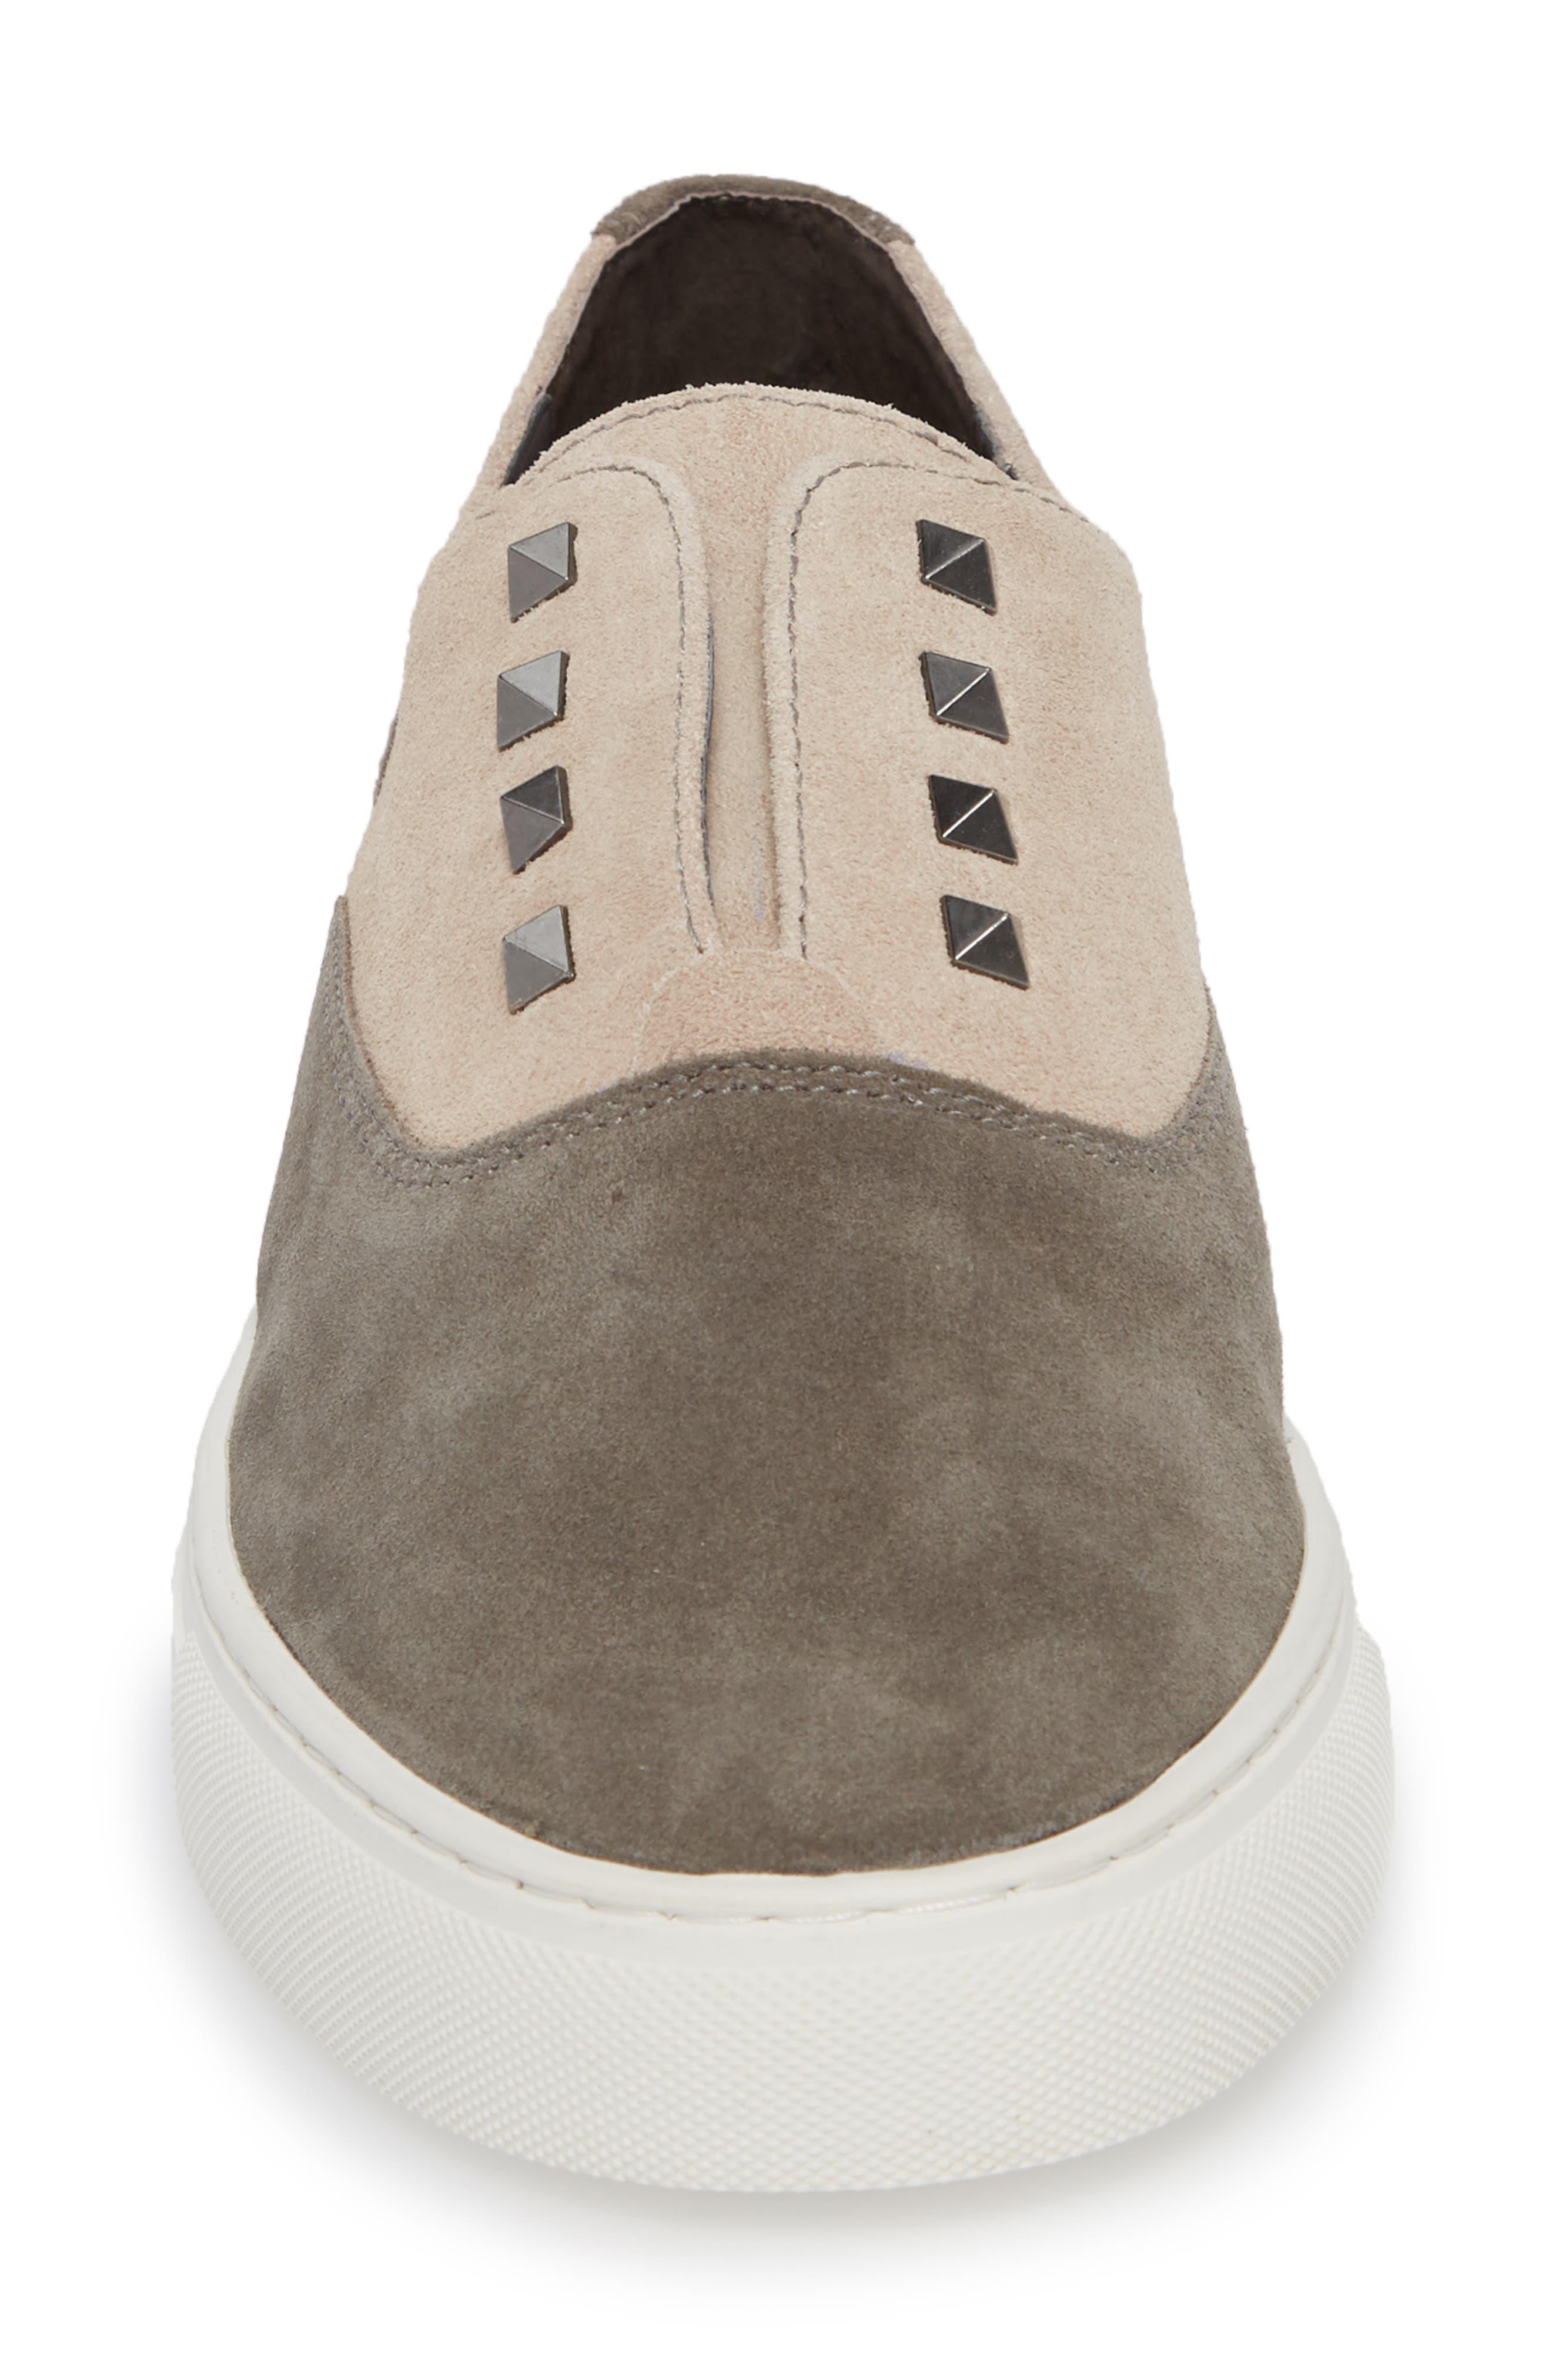 Aryo Studded Laceless Sneaker,                             Alternate thumbnail 8, color,